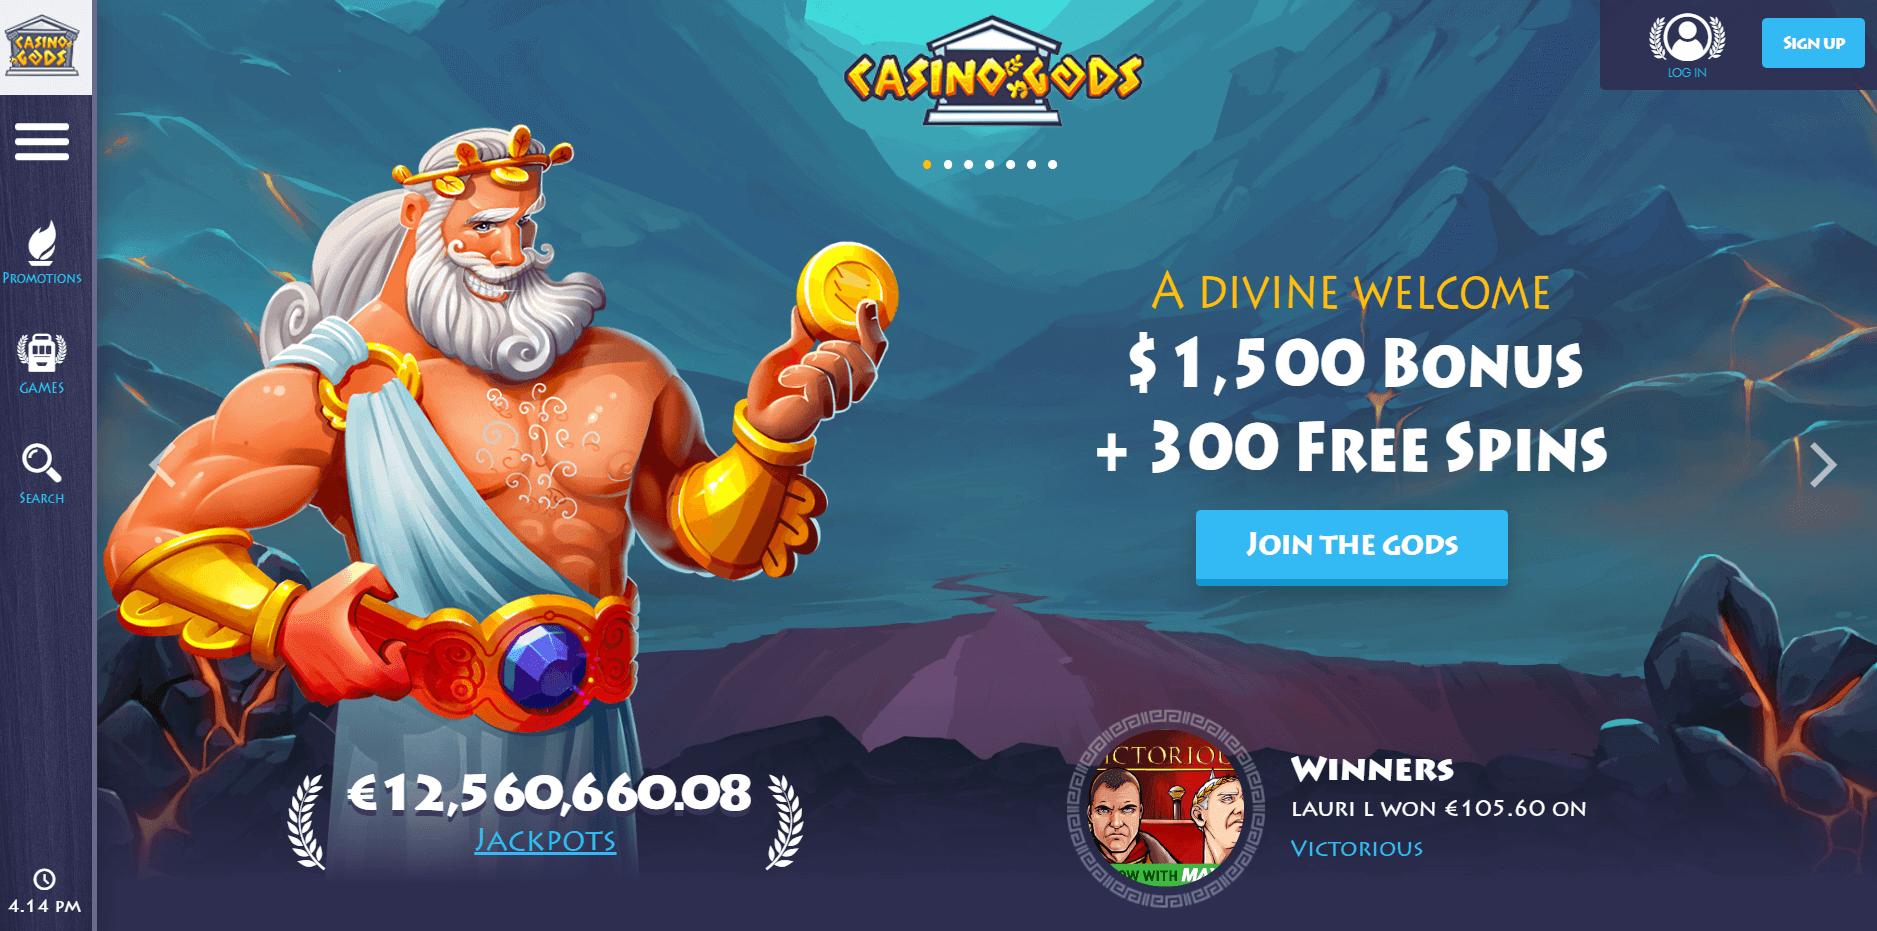 God And Gambling